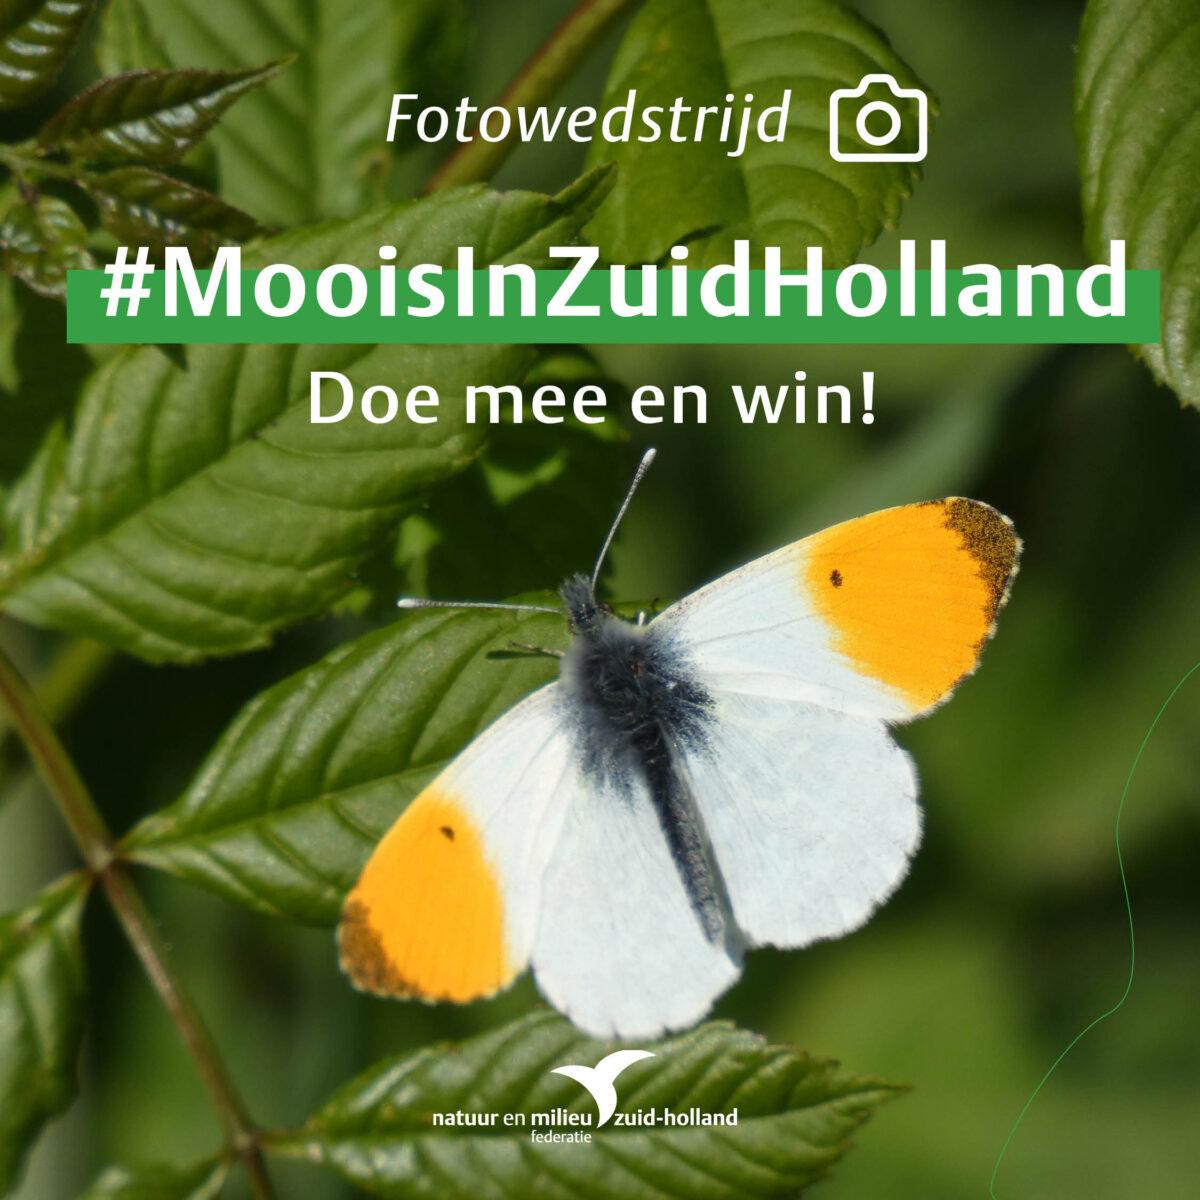 'Moois in Zuid-Holland' fotowedstrijd